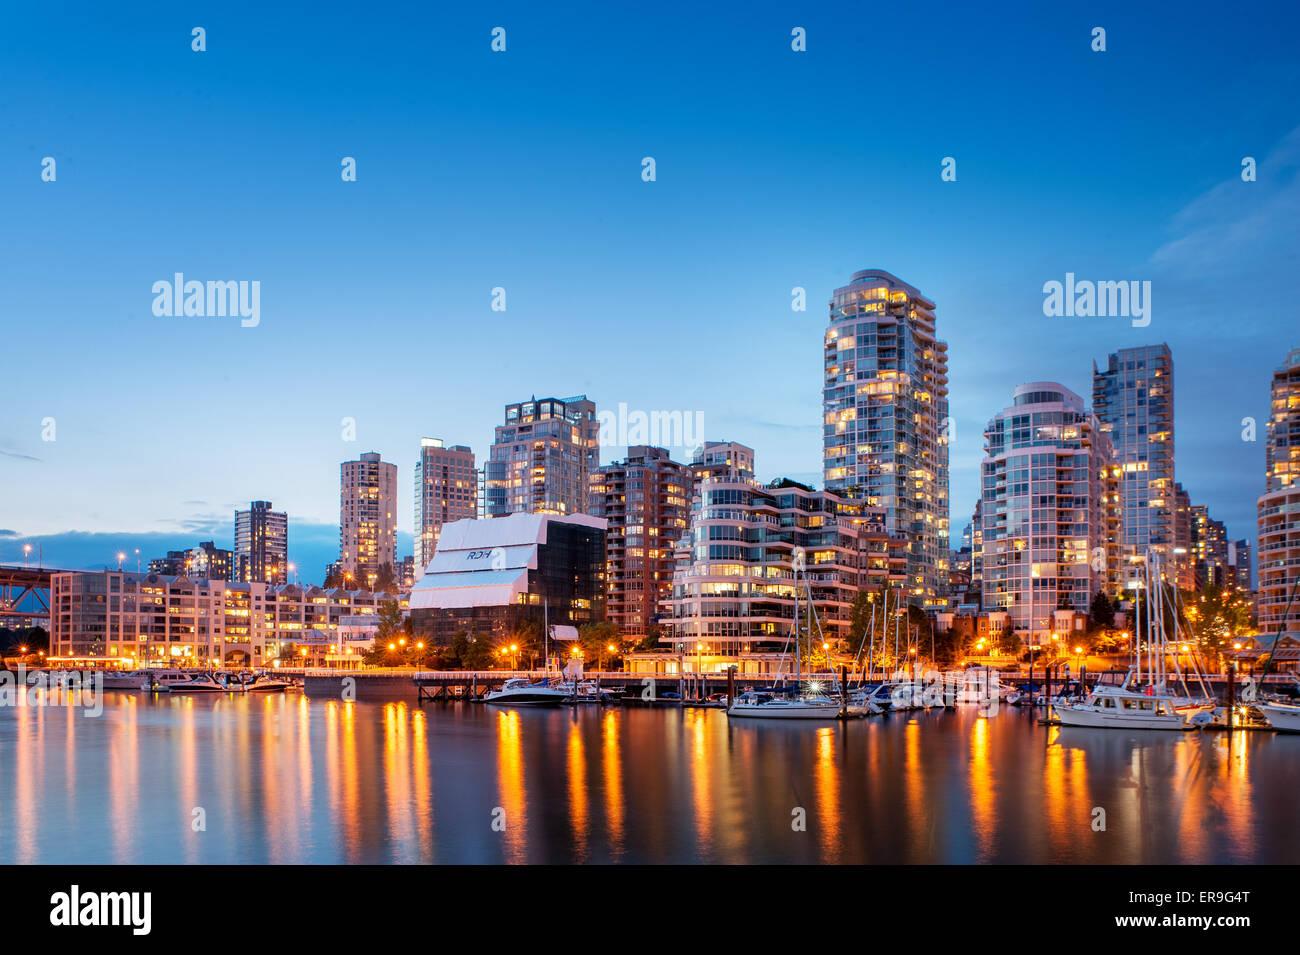 Vancouver skyline al atardecer. Vancouver, British Columbia, Canadá Imagen De Stock